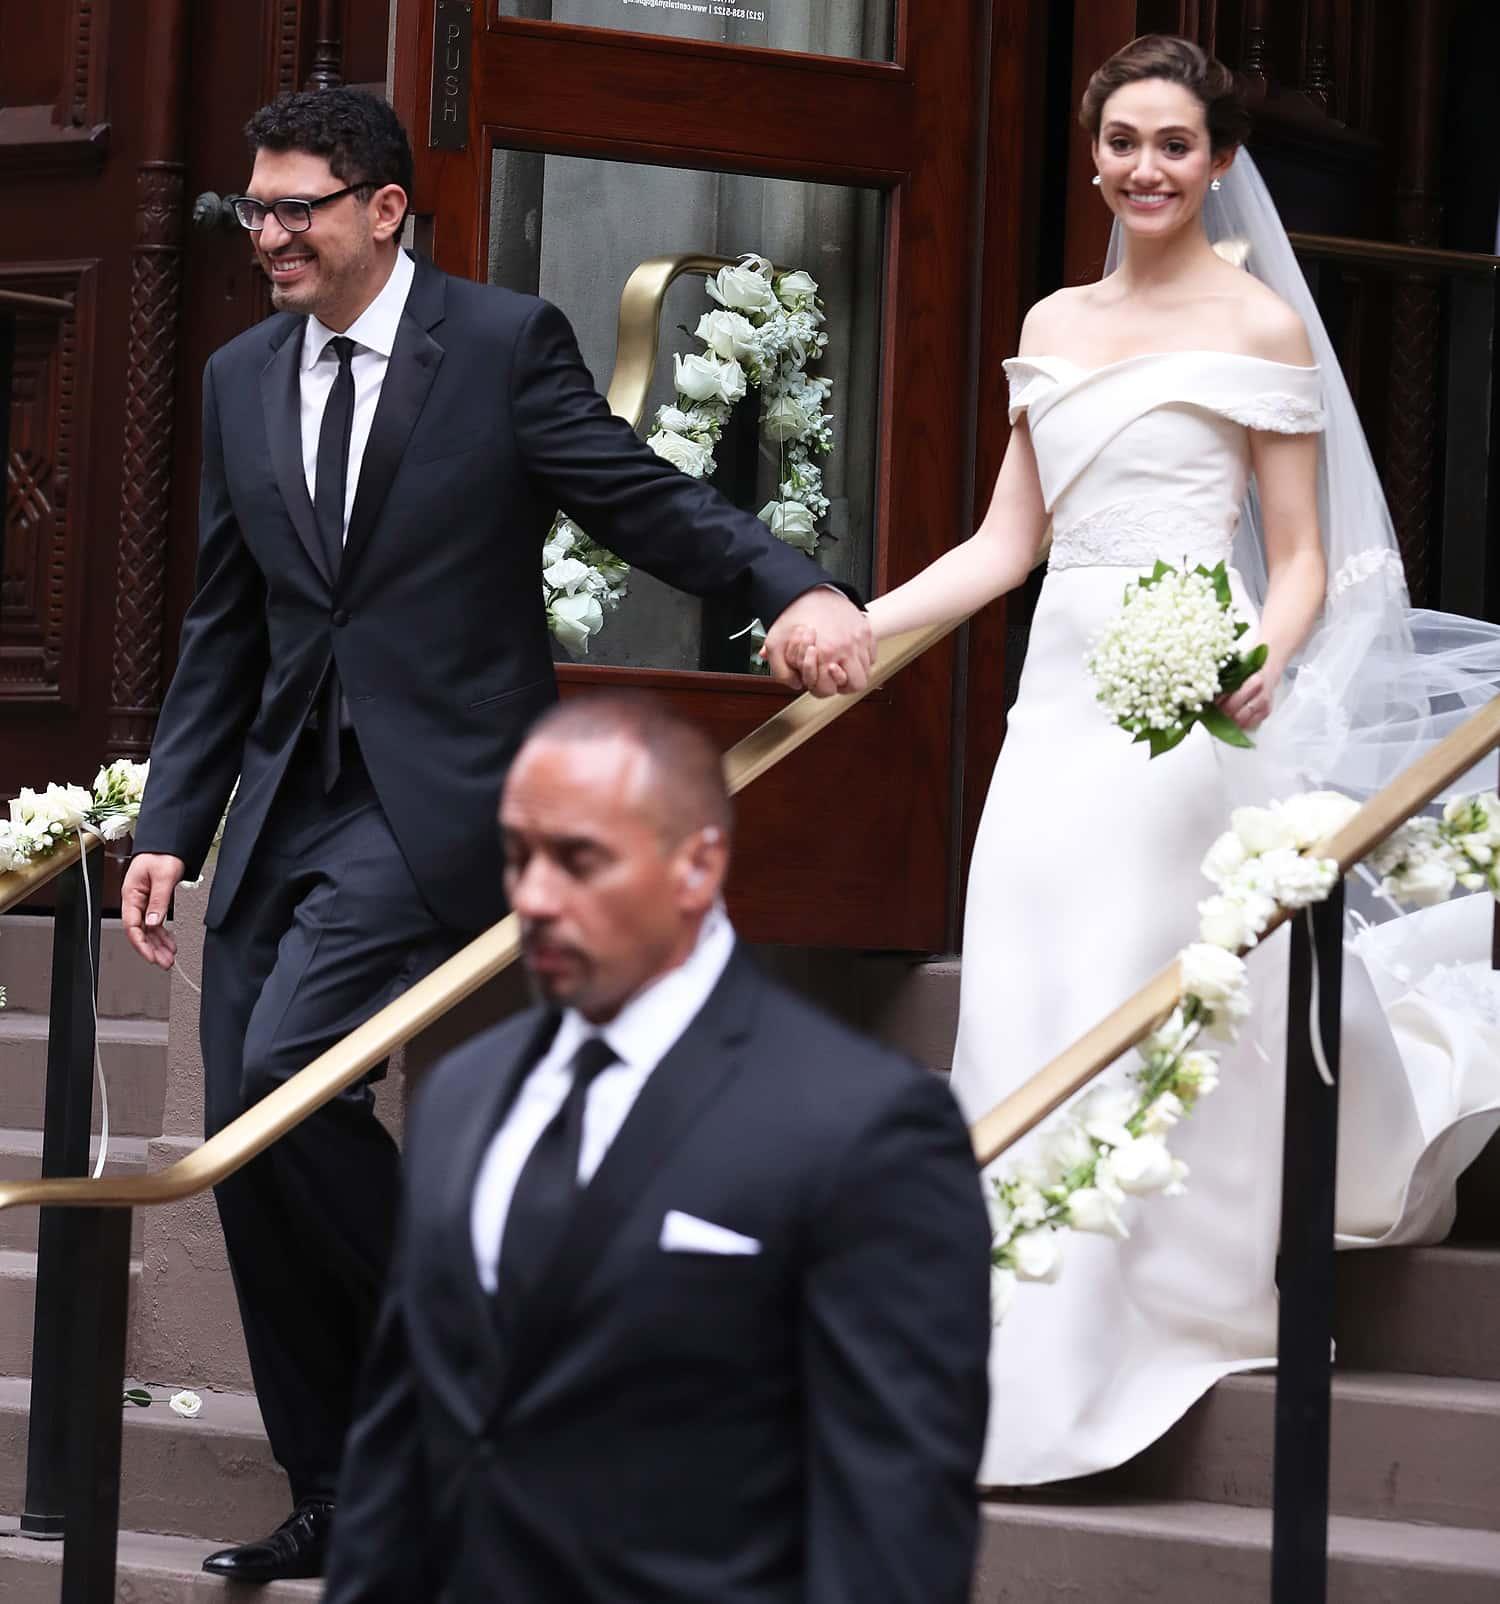 PREMIUM EXCLUSIVE: Emmy Rossum Weds Sam Esmail